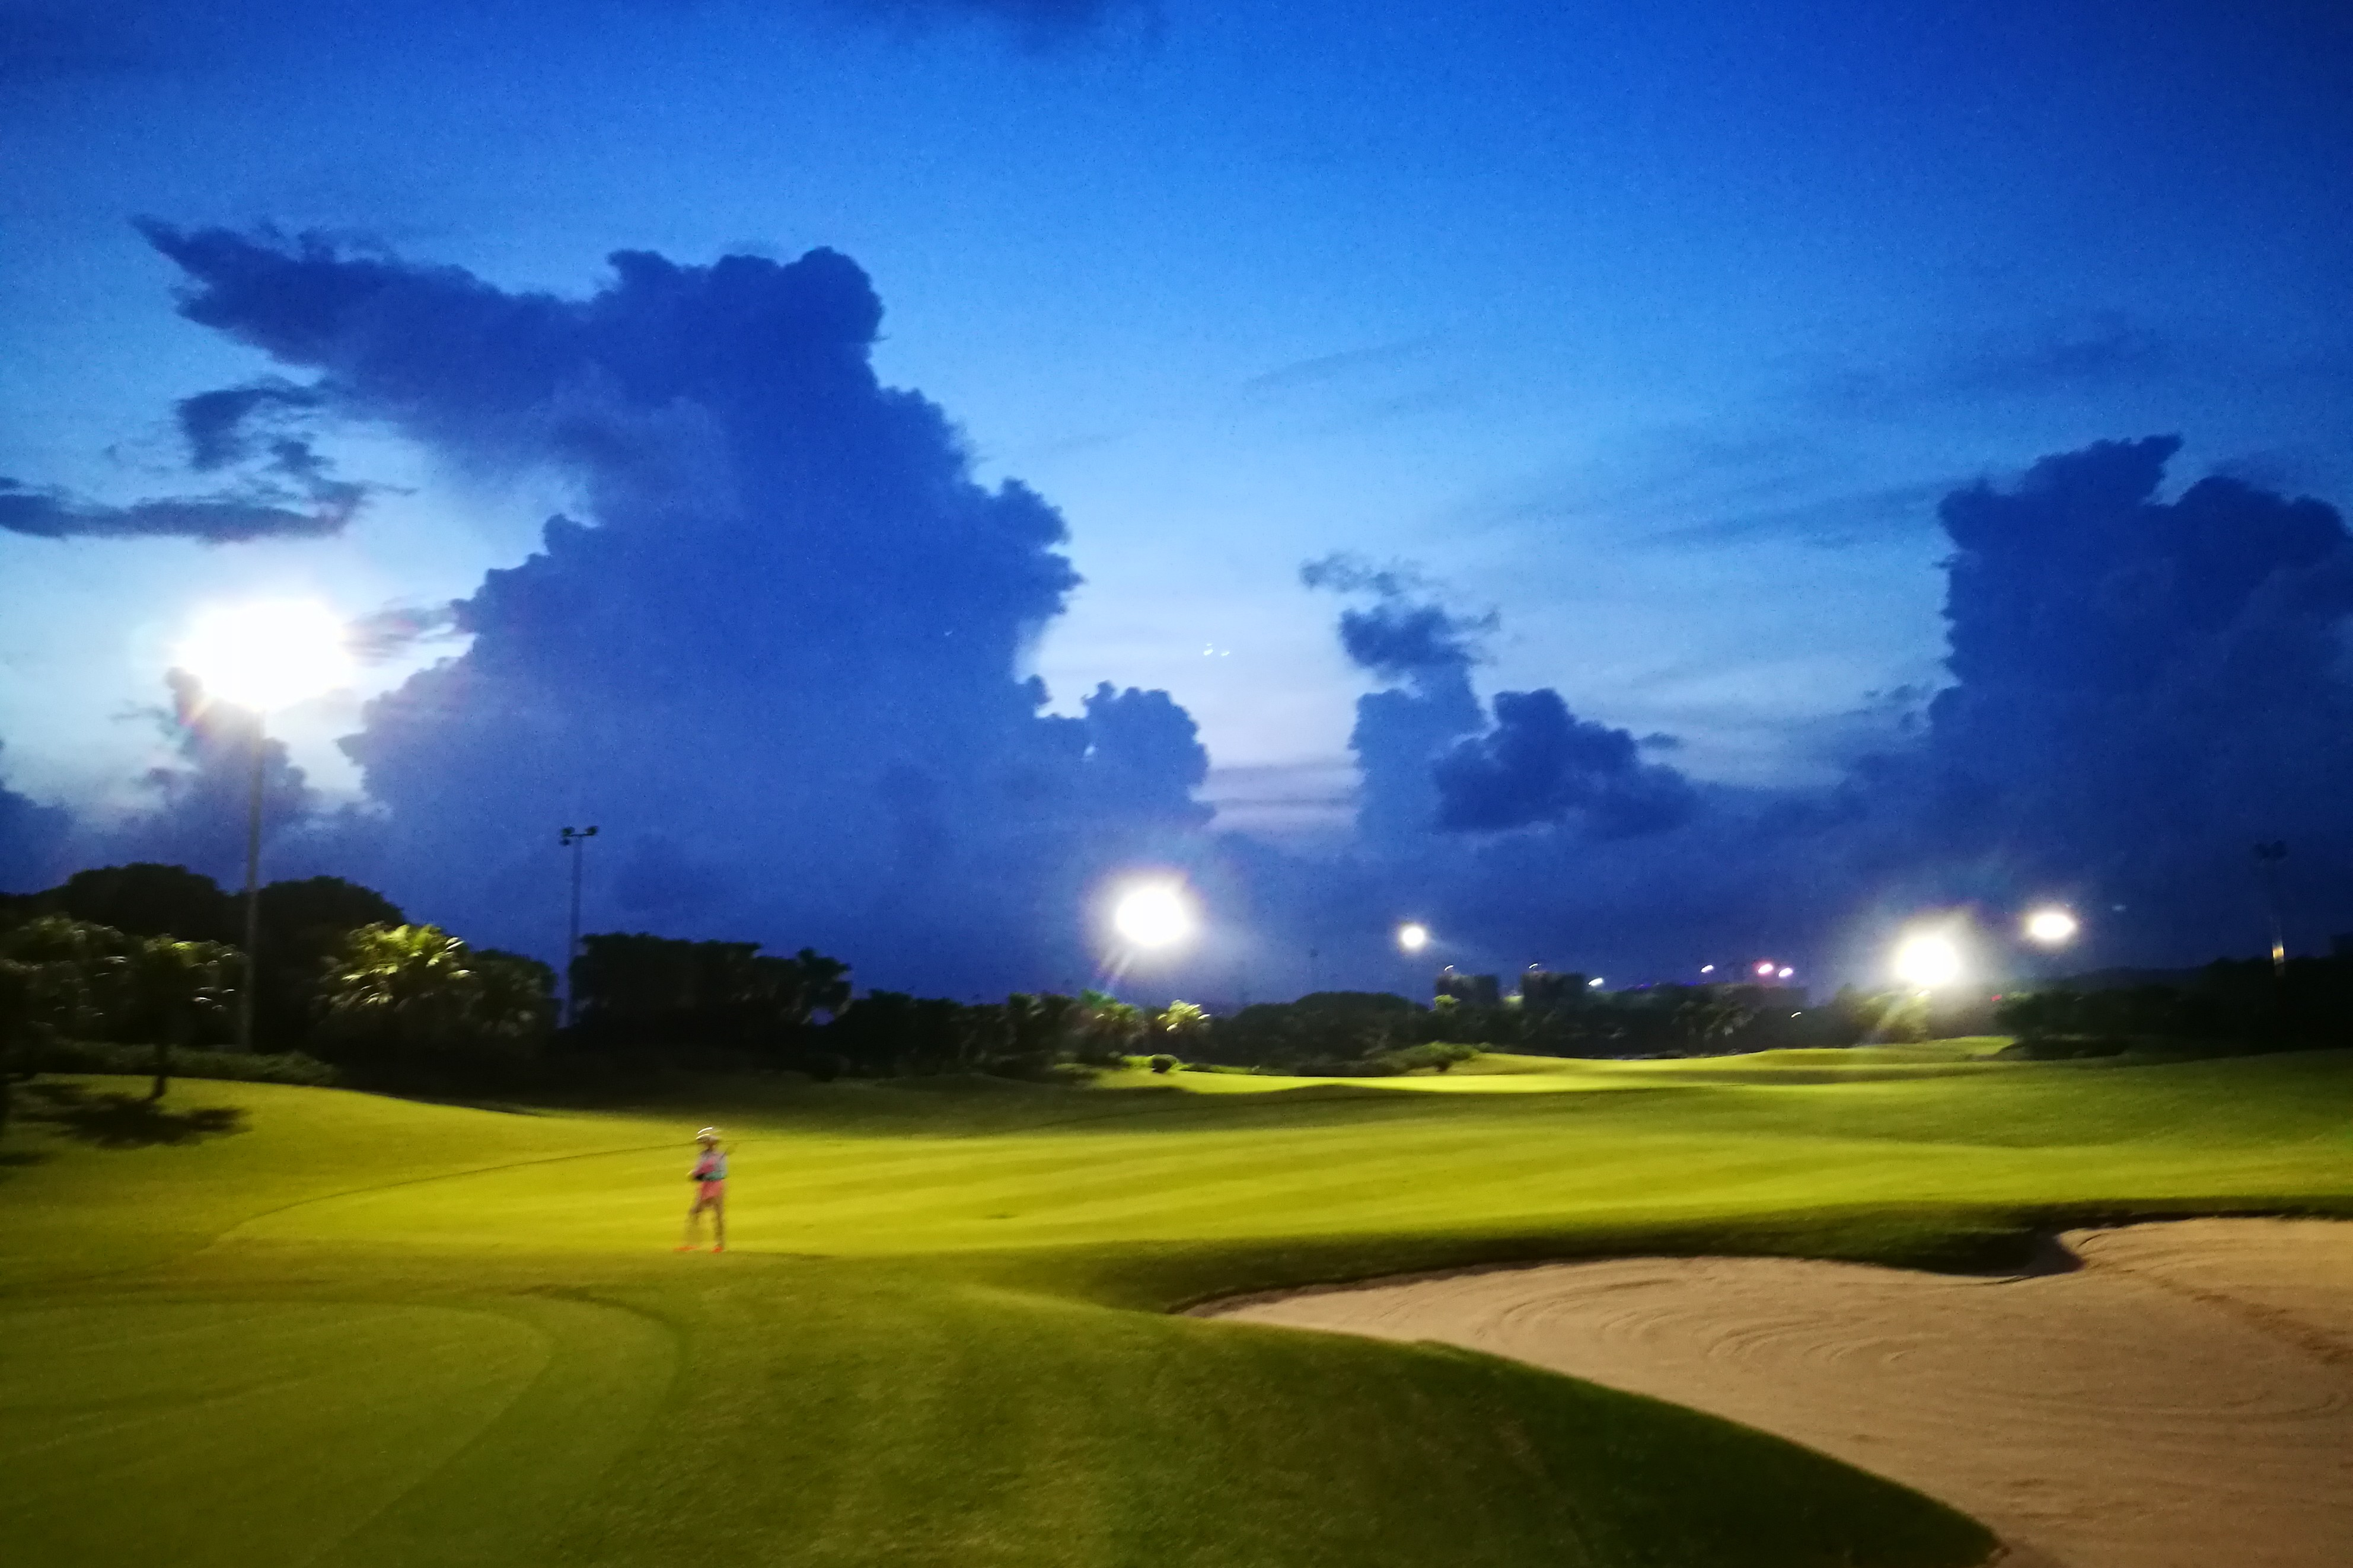 Zhuhai Golden Gulf Golf Club Nighttime photo